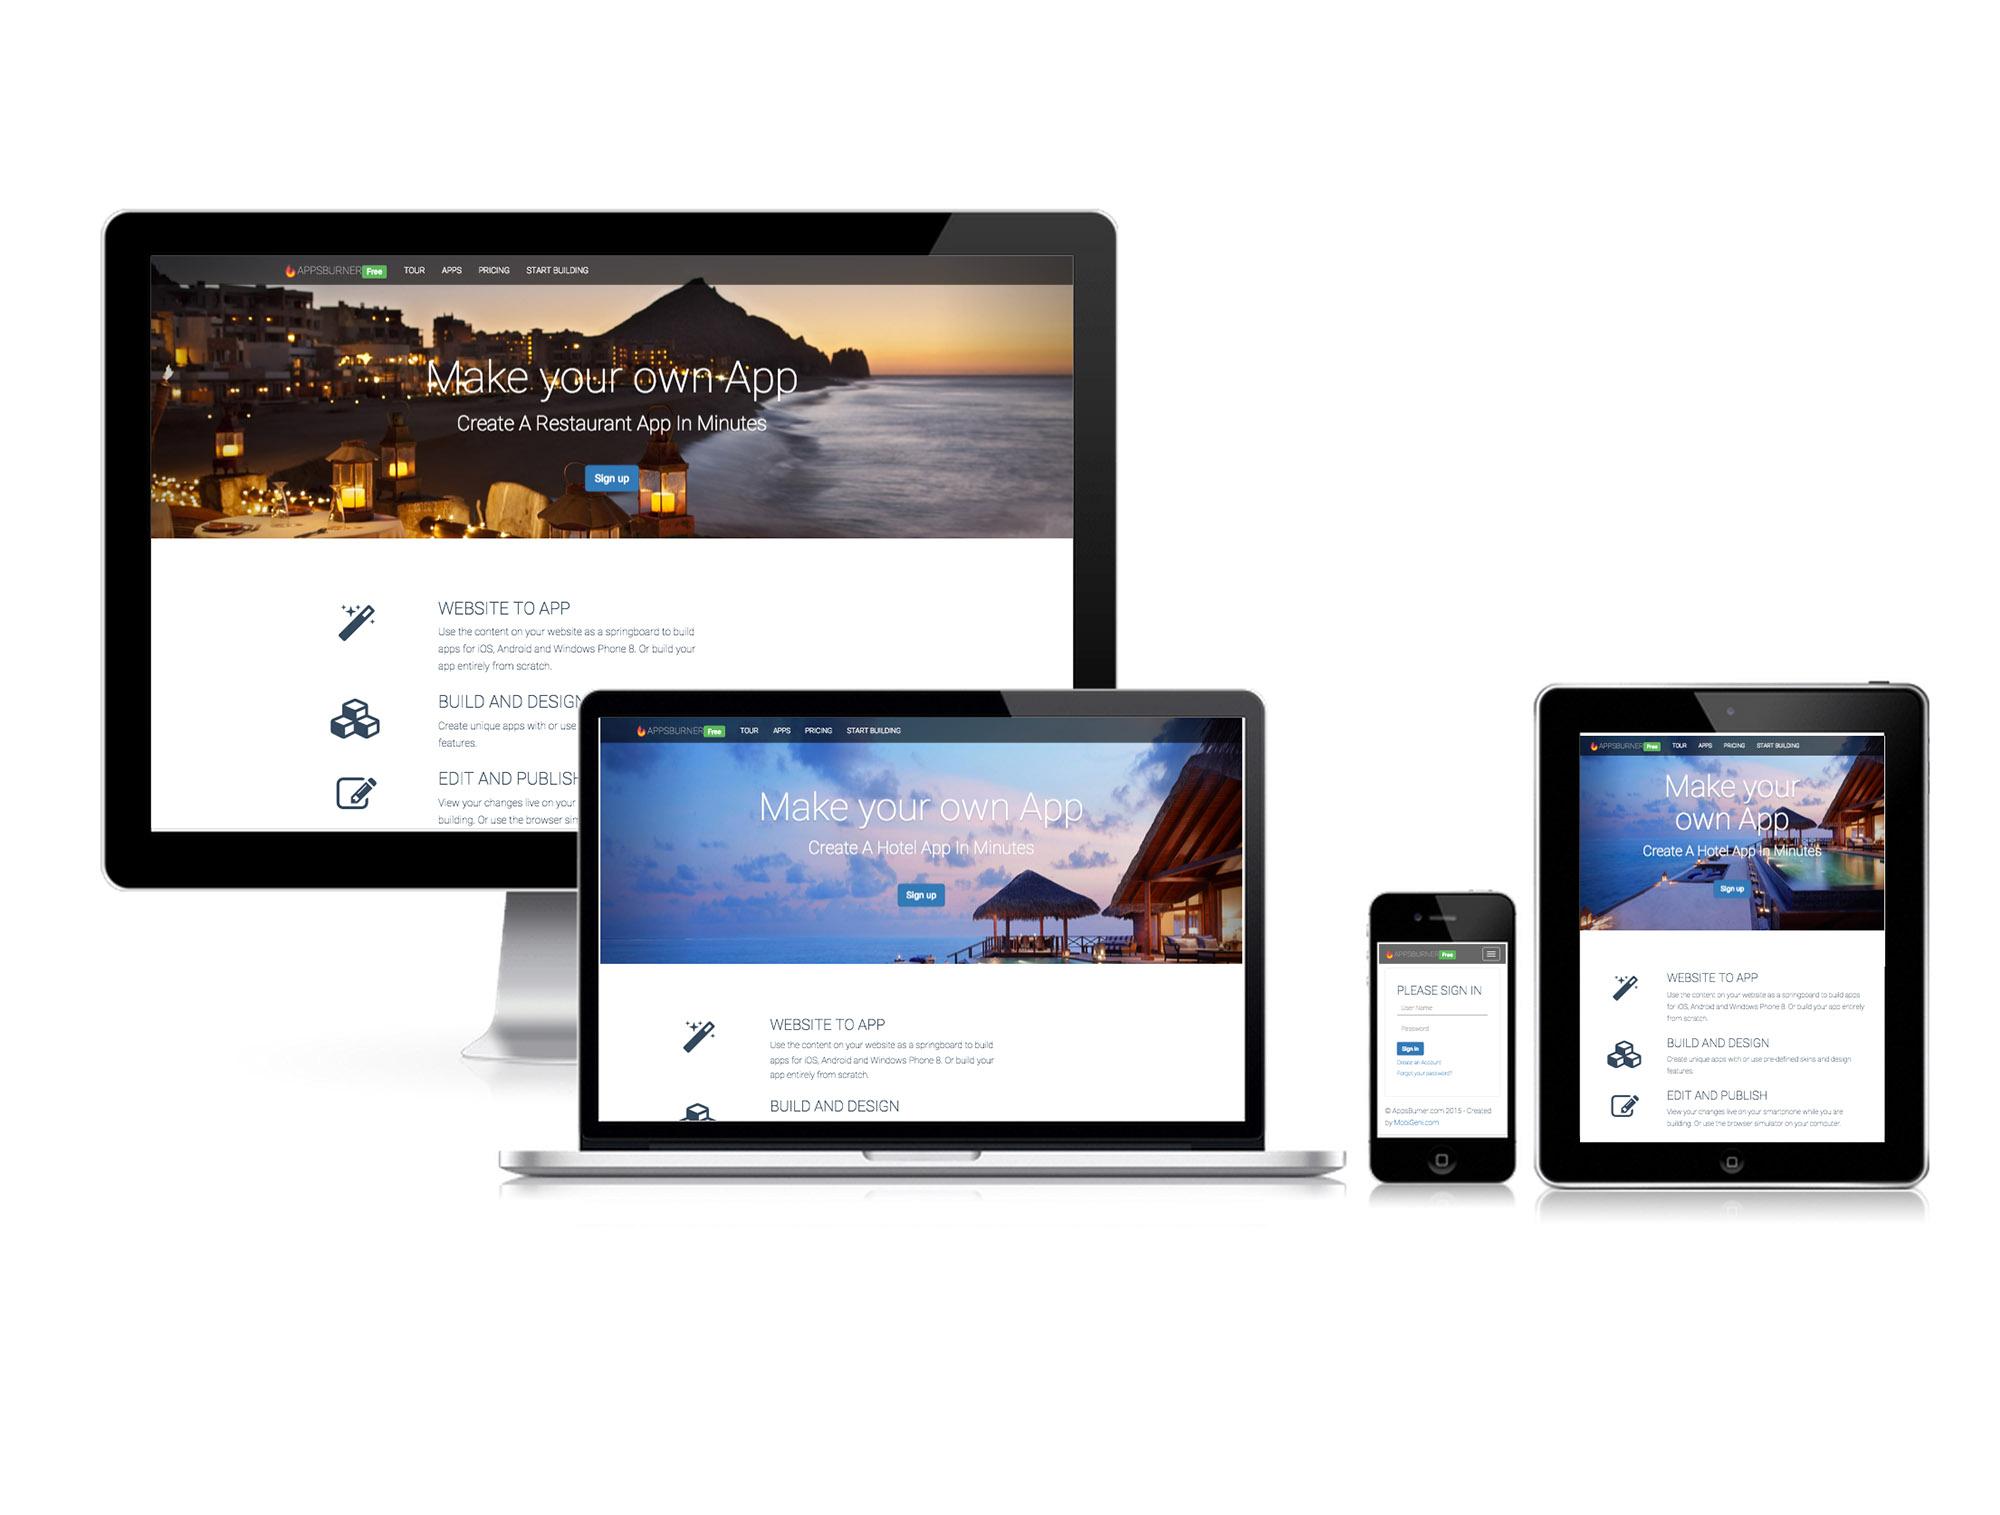 responsive website tester mockup screenshot generator by vidal